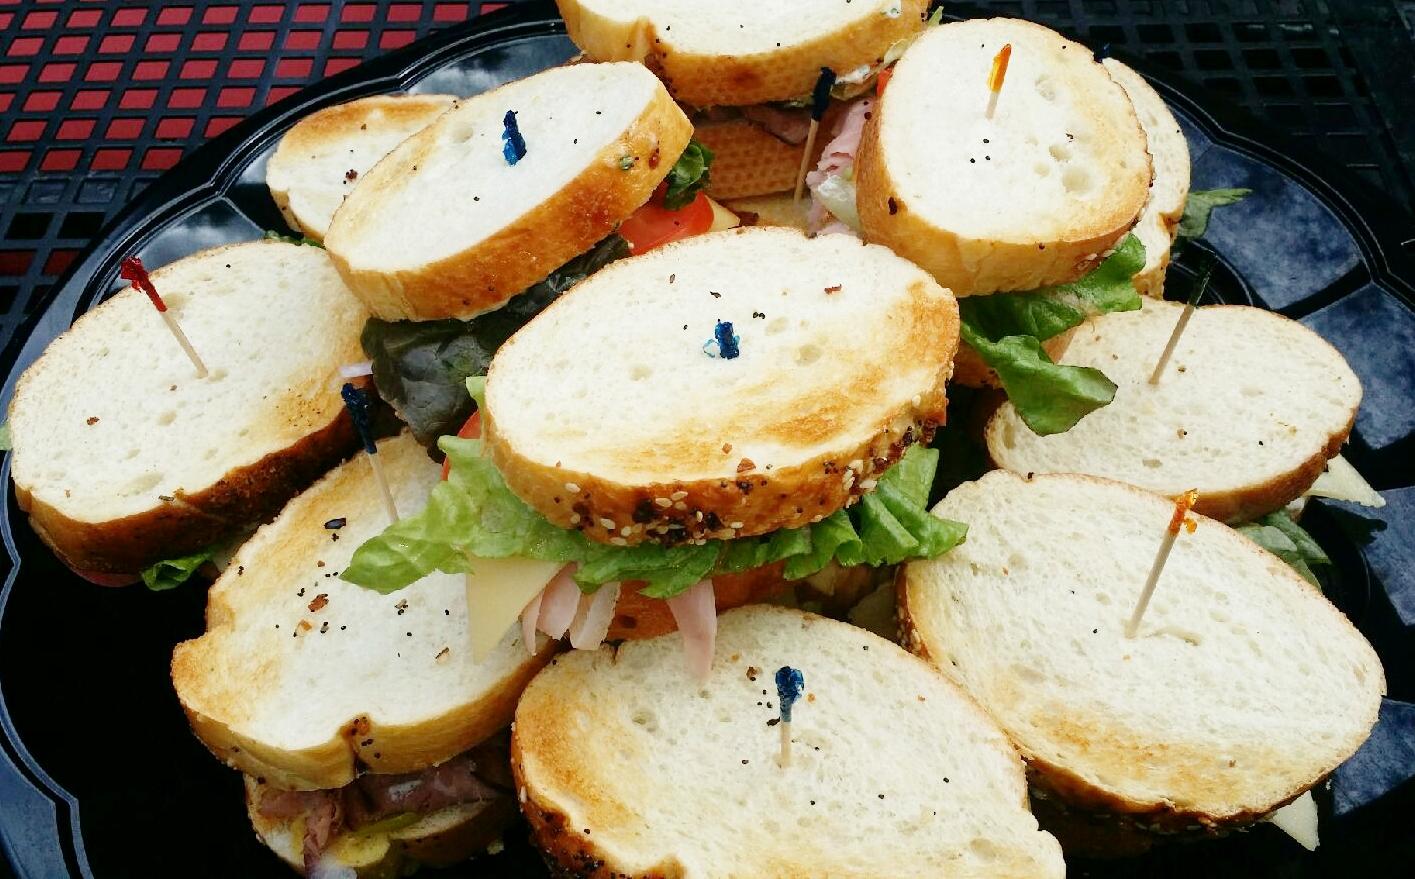 Sandwich Tray 3.JPG